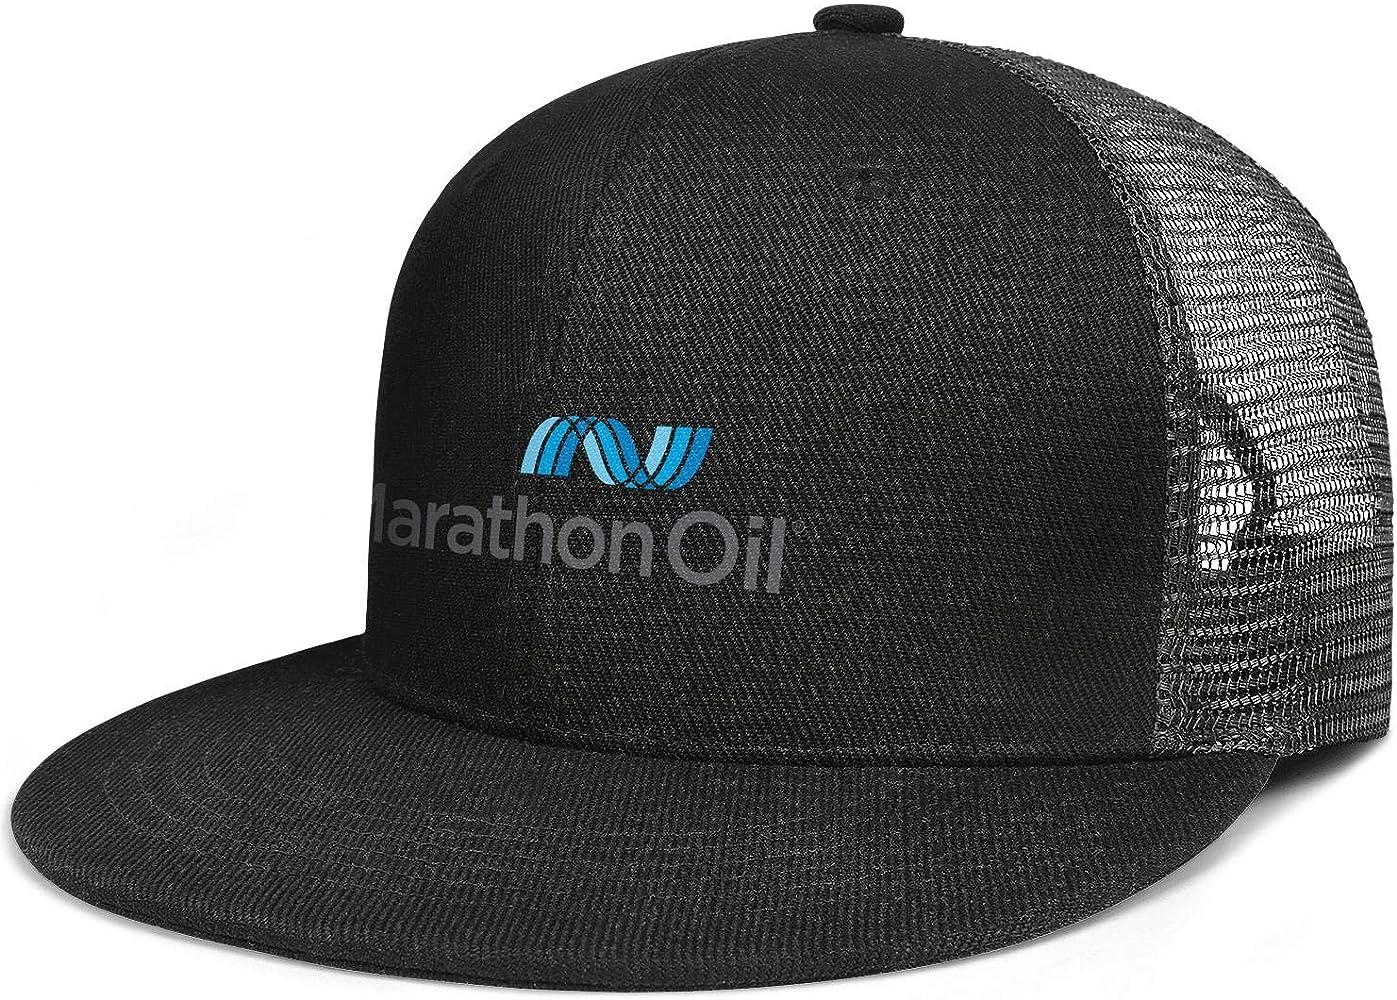 Unisex One Size Baseball Cap Marathon-Oil-Logo Plain Distressed Cotton Adult Cap